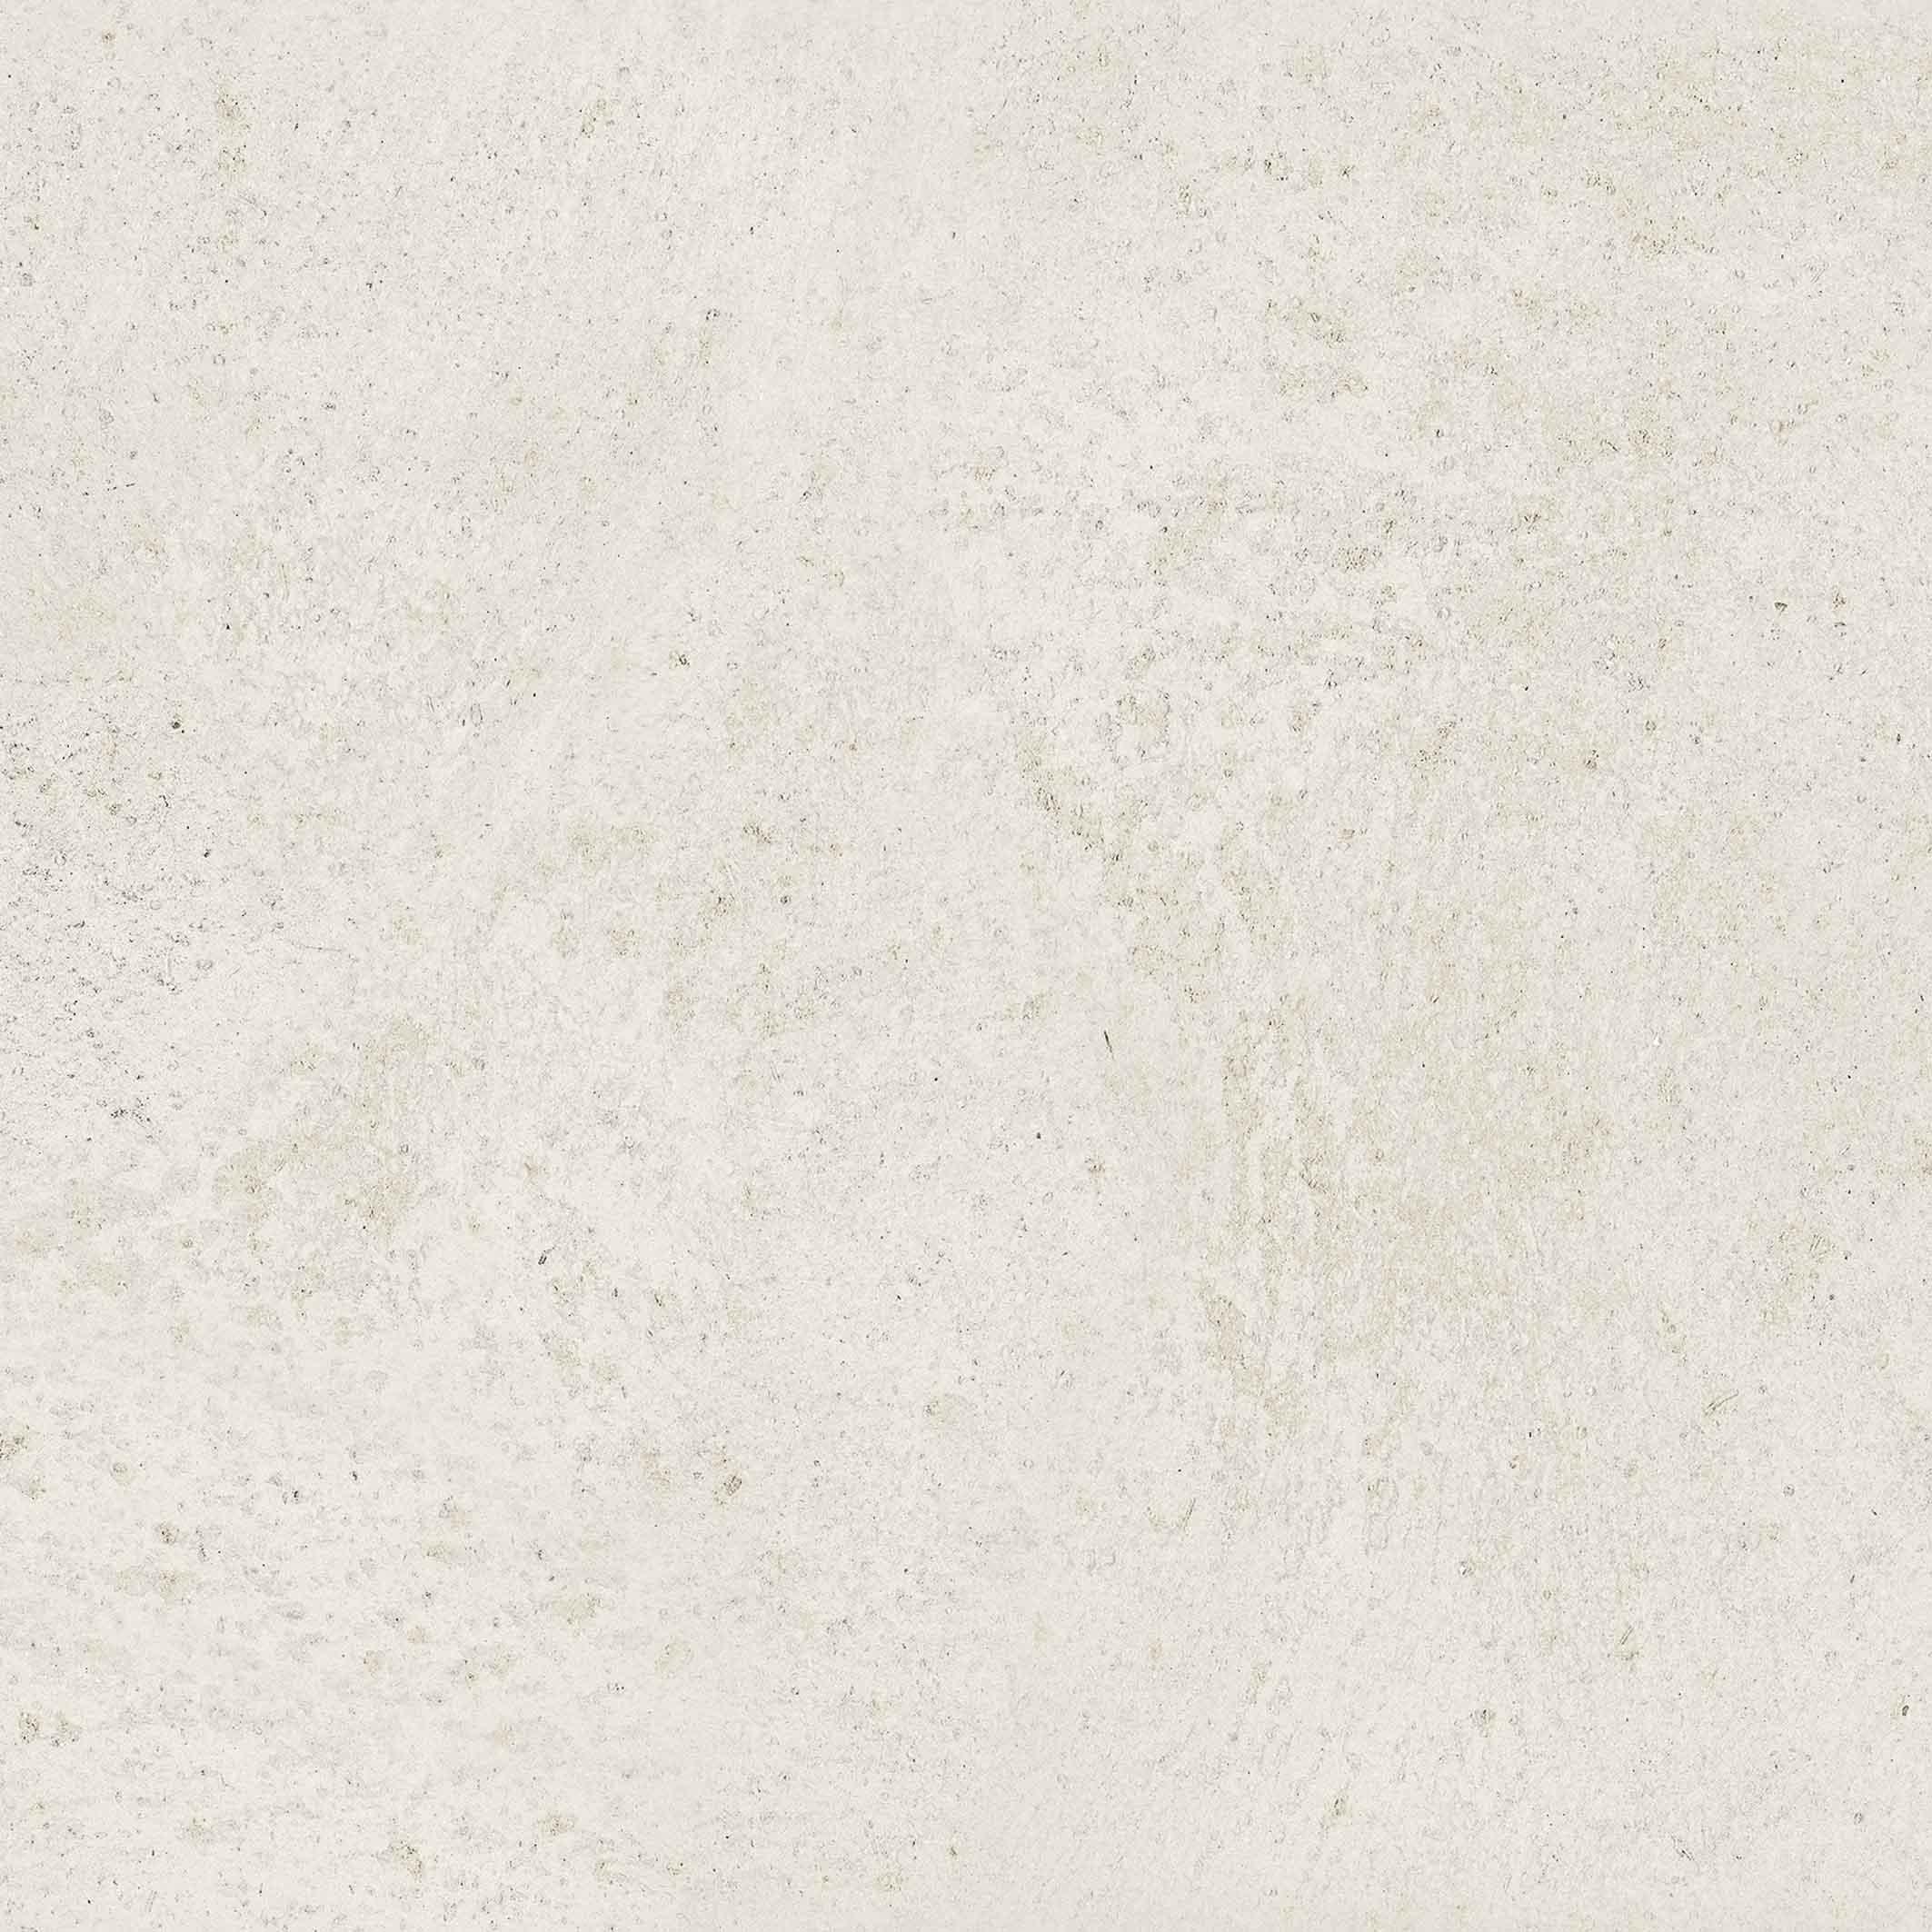 Maps of Cerim White Matte 10mm 80 x 80